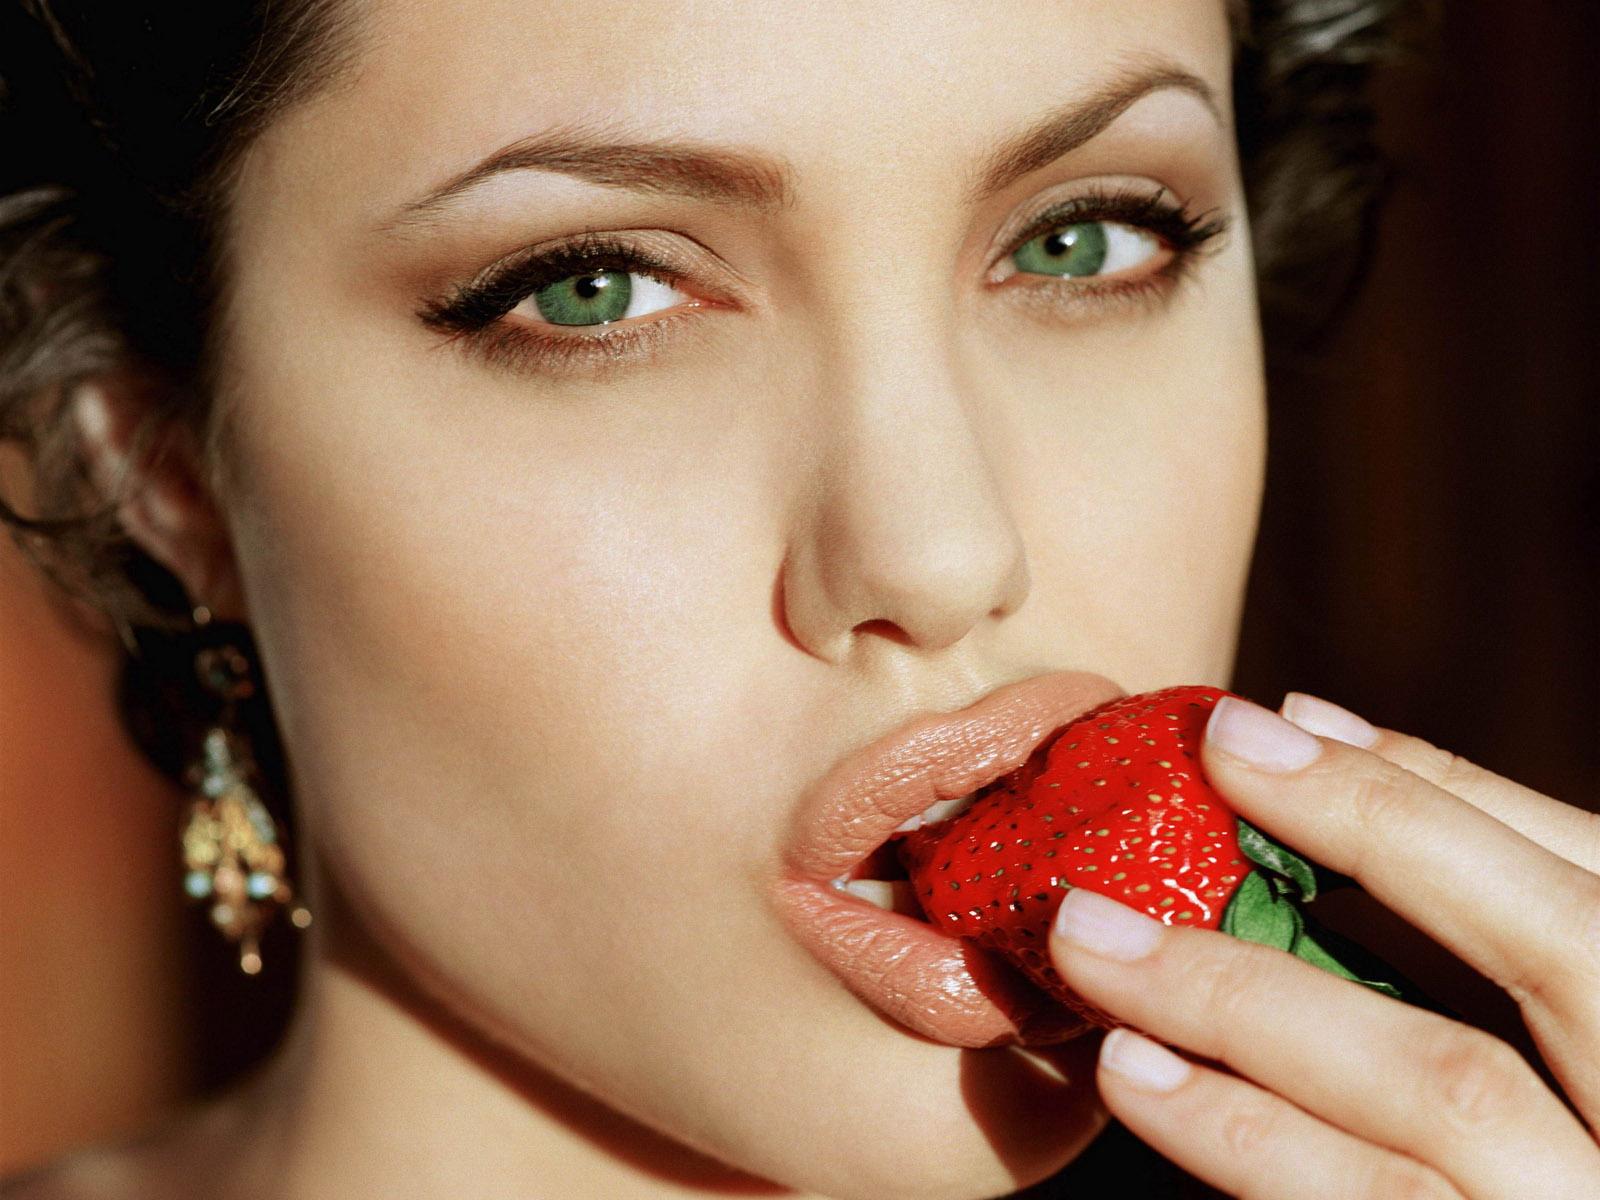 http://1.bp.blogspot.com/-cf2iS9yVpQI/UNRPU_K33FI/AAAAAAAABIg/Njf_Aje7ciA/s1600/Angelina+Jolie-Wallpaper-2.jpg